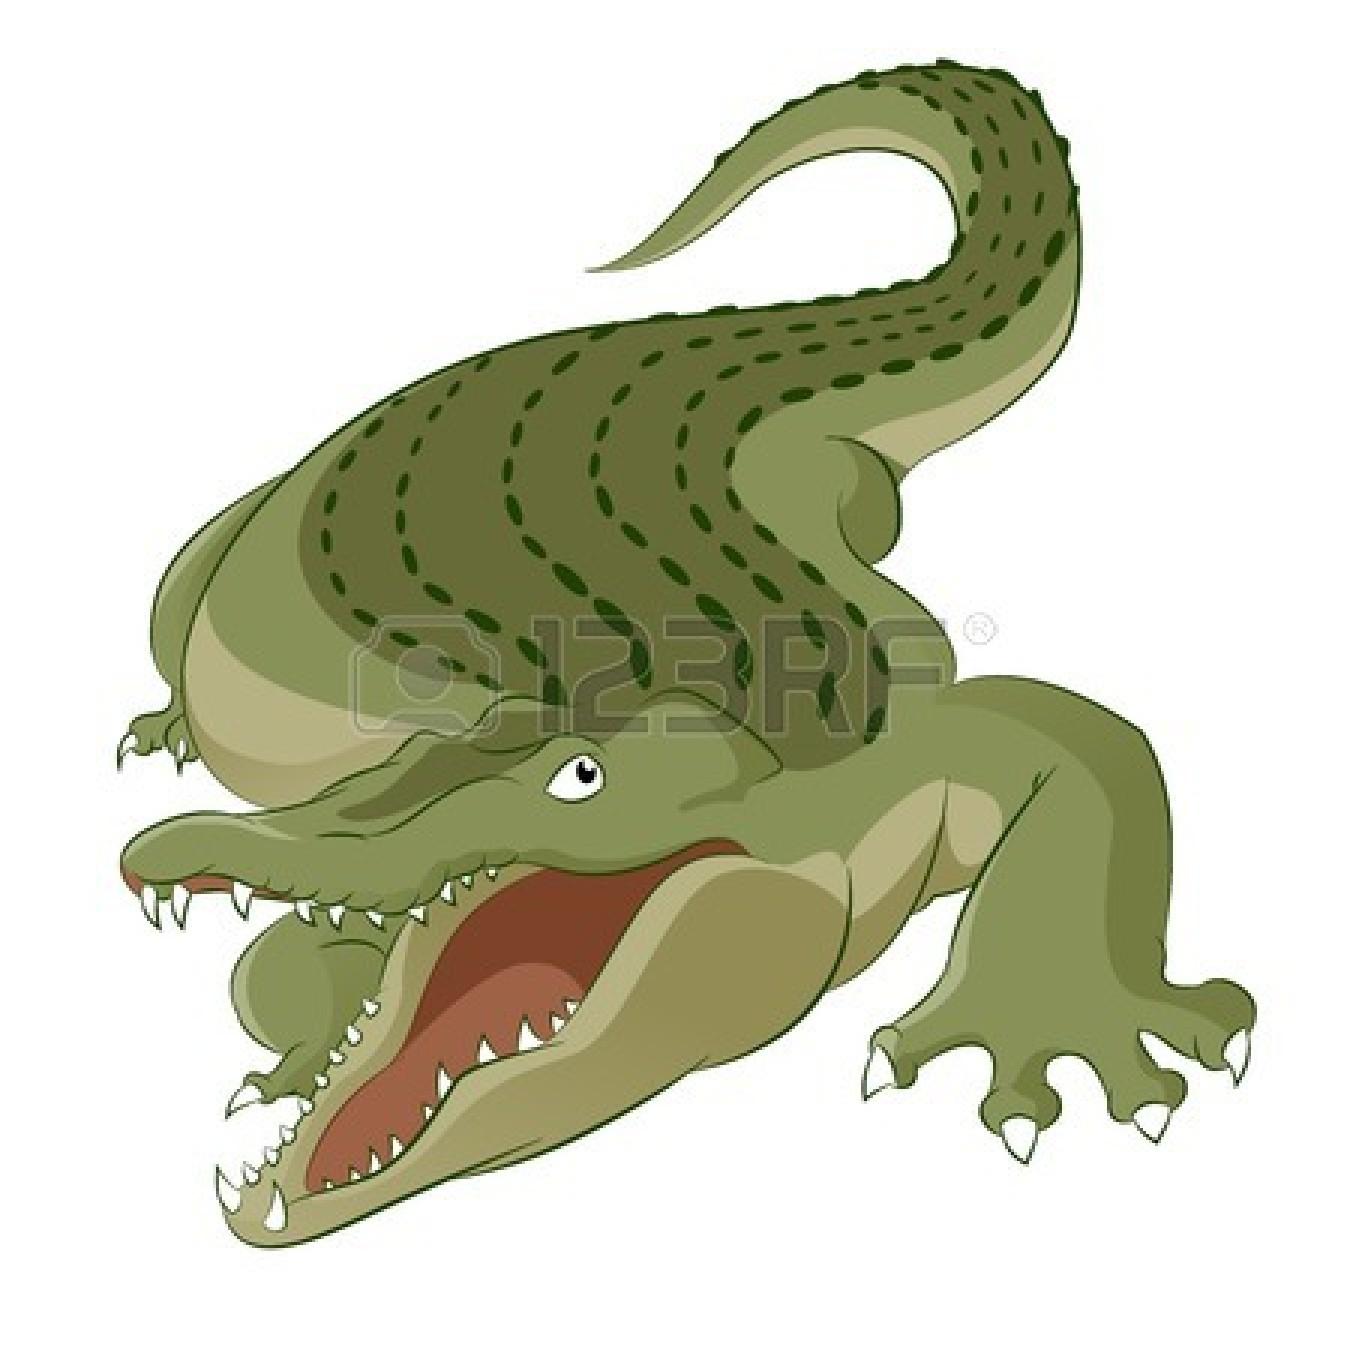 Scary crocodile clipart.